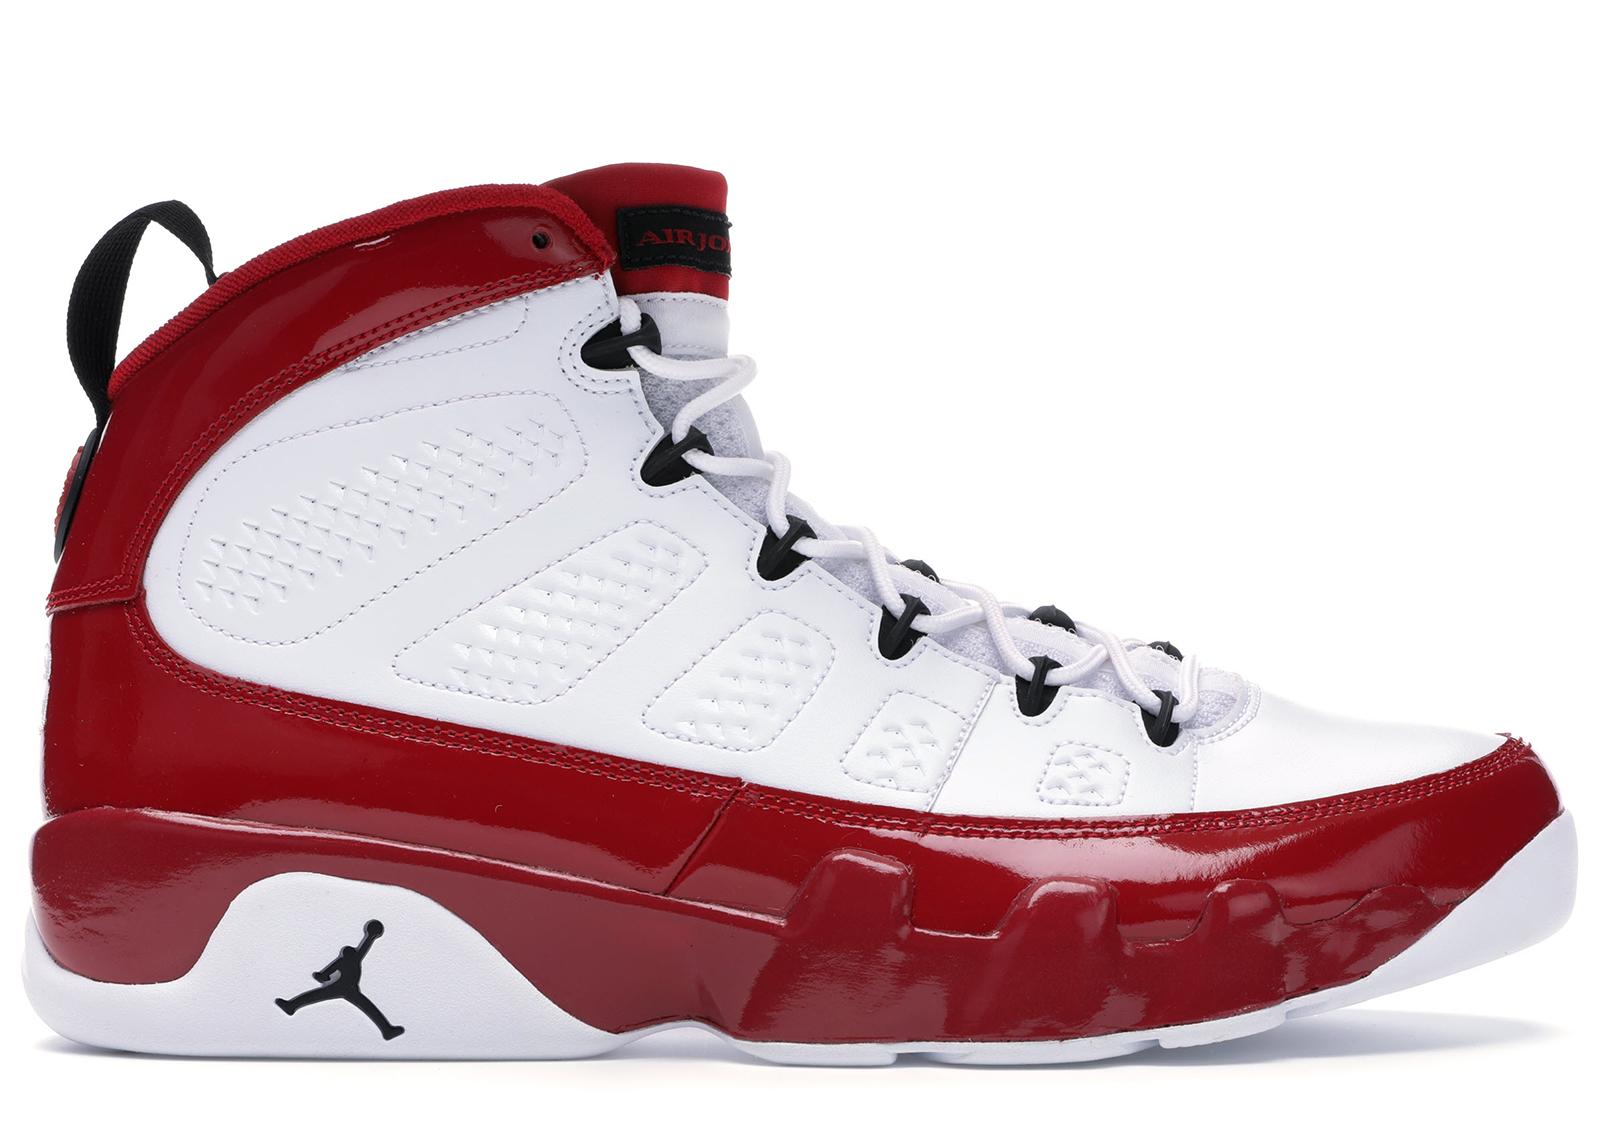 Jordan 9 Retro White Gym Red - 302370-160